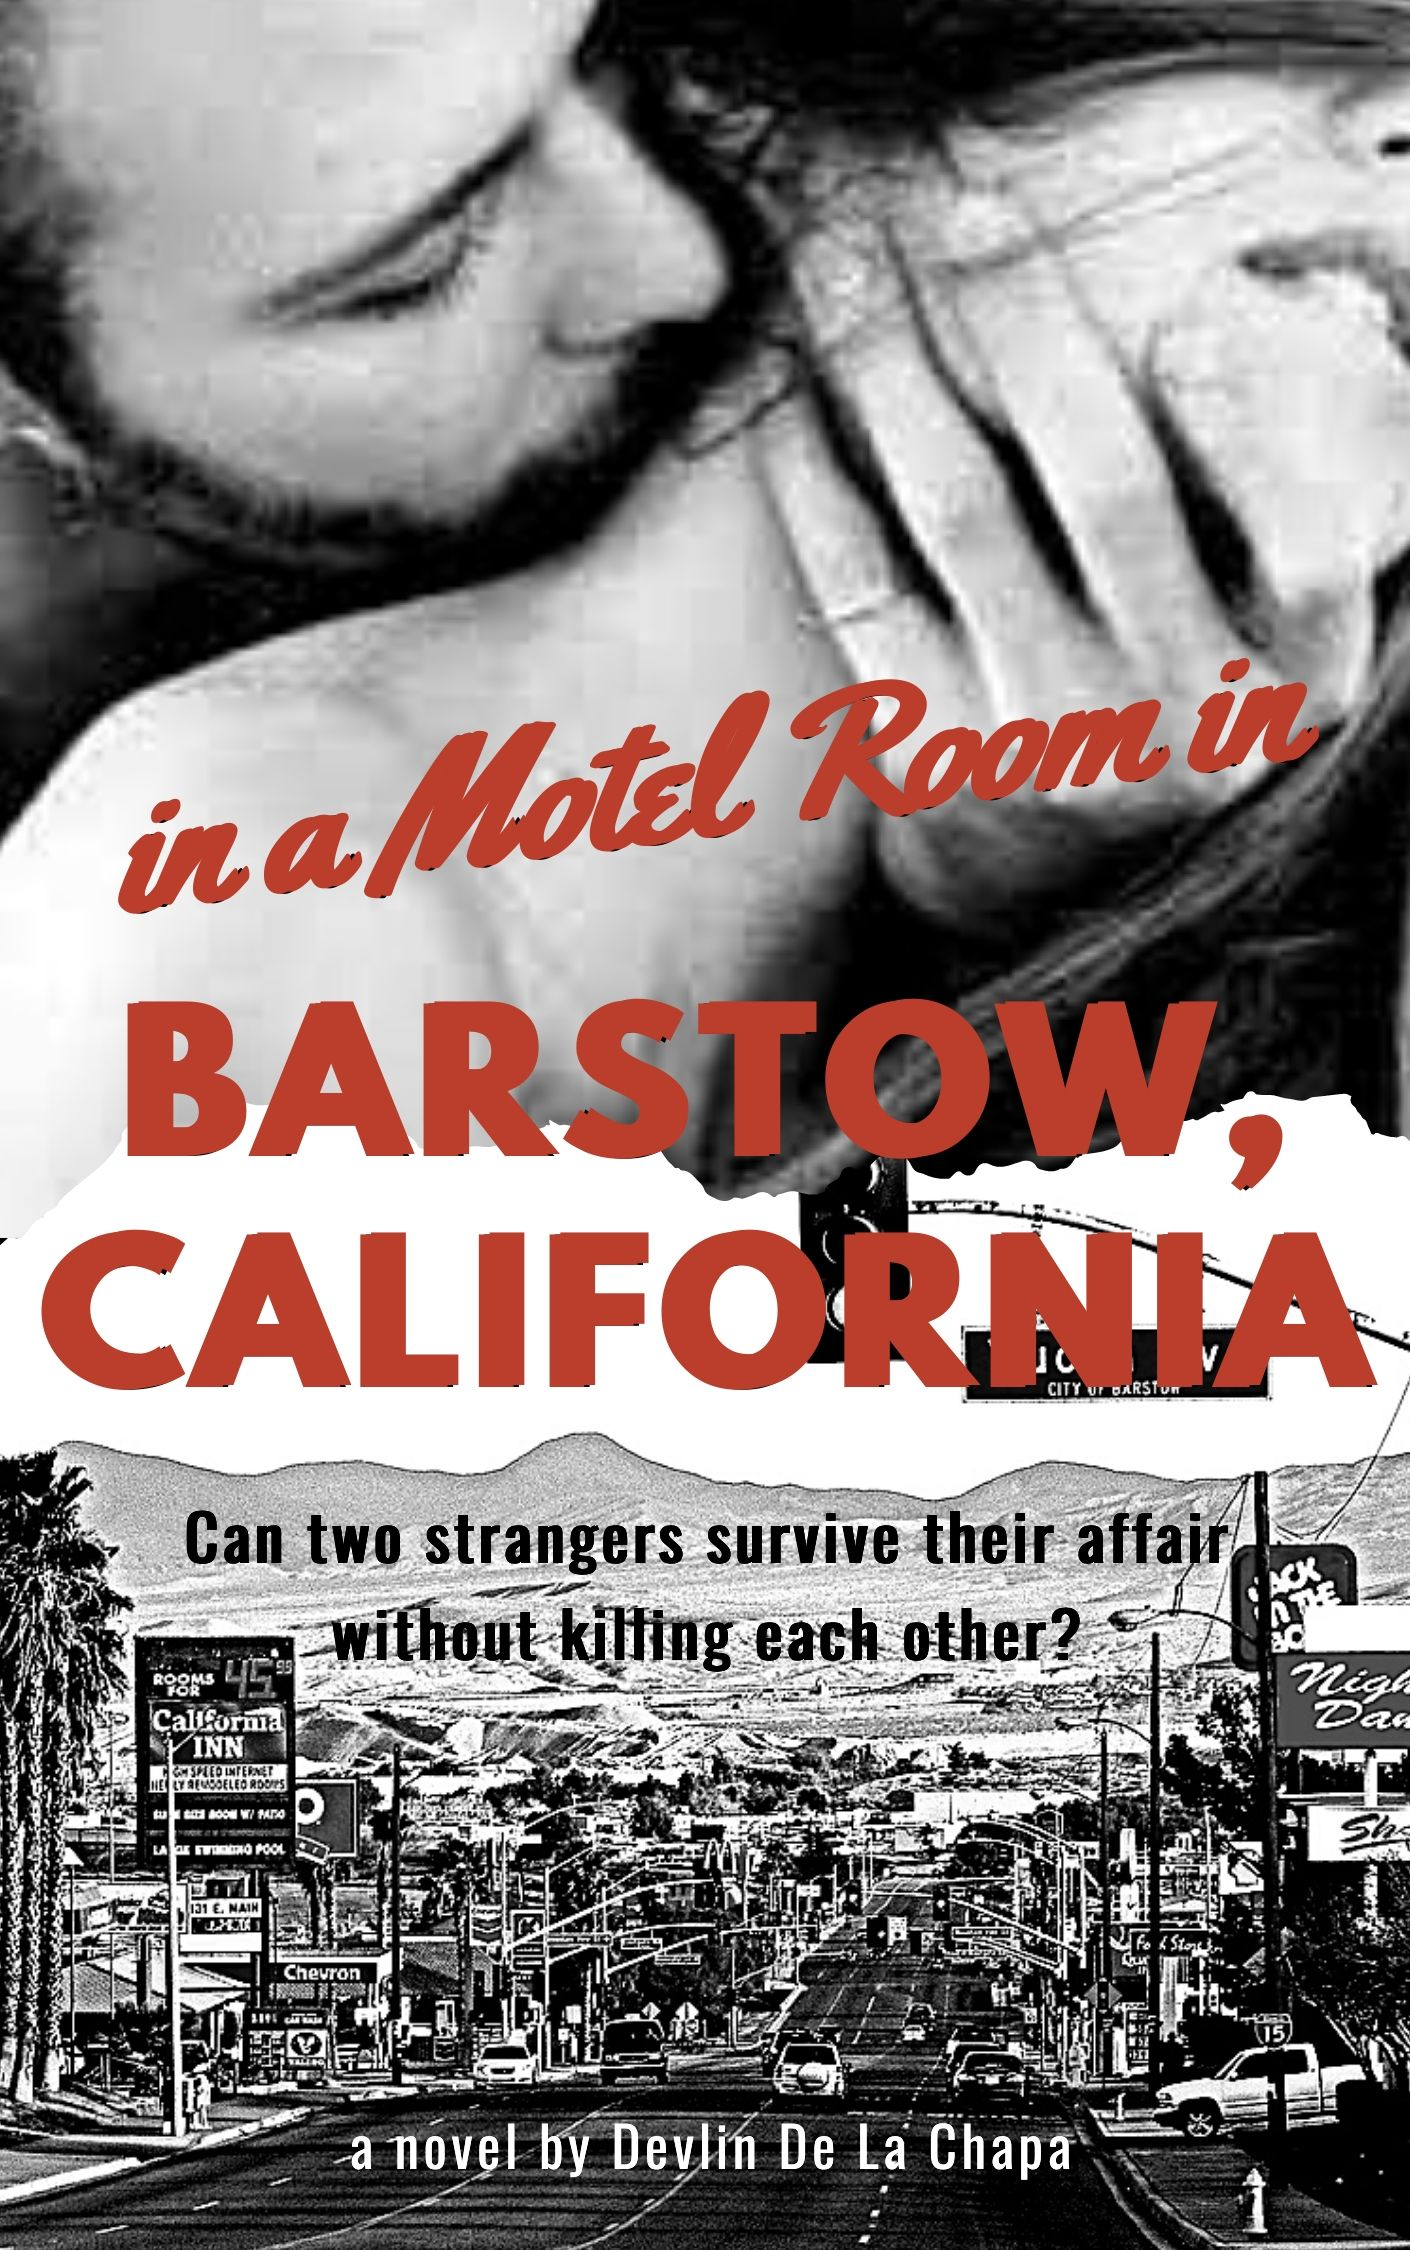 Barstow, CA BC iii